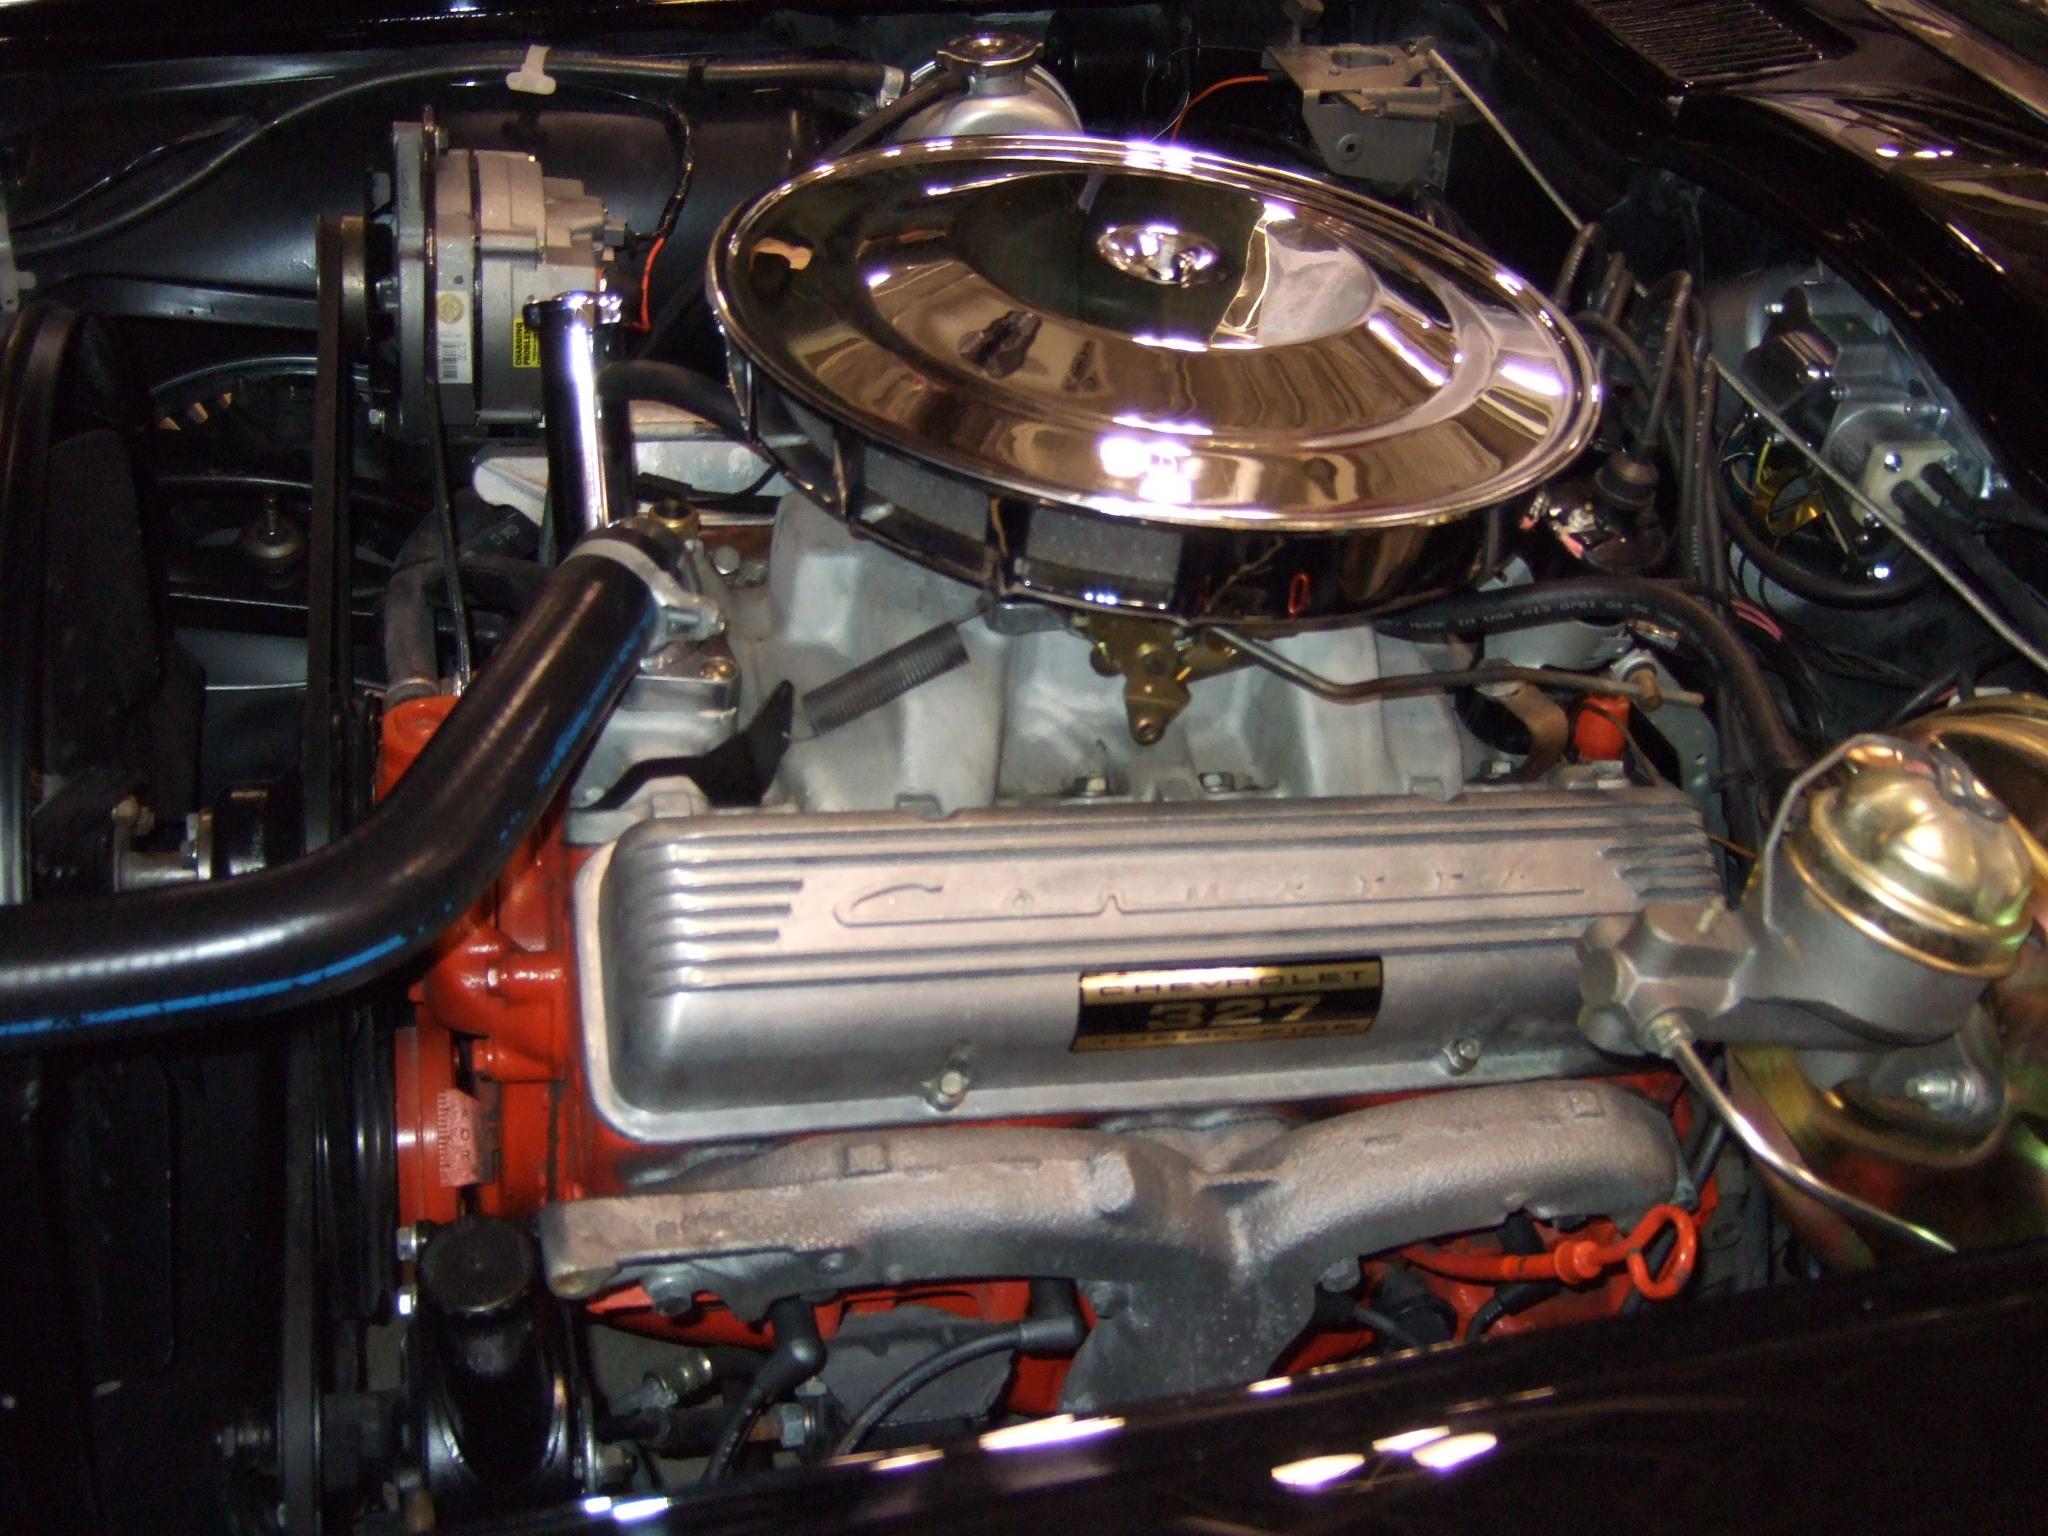 DSCF7480 | The Corvette Society Celebrating 25 Years